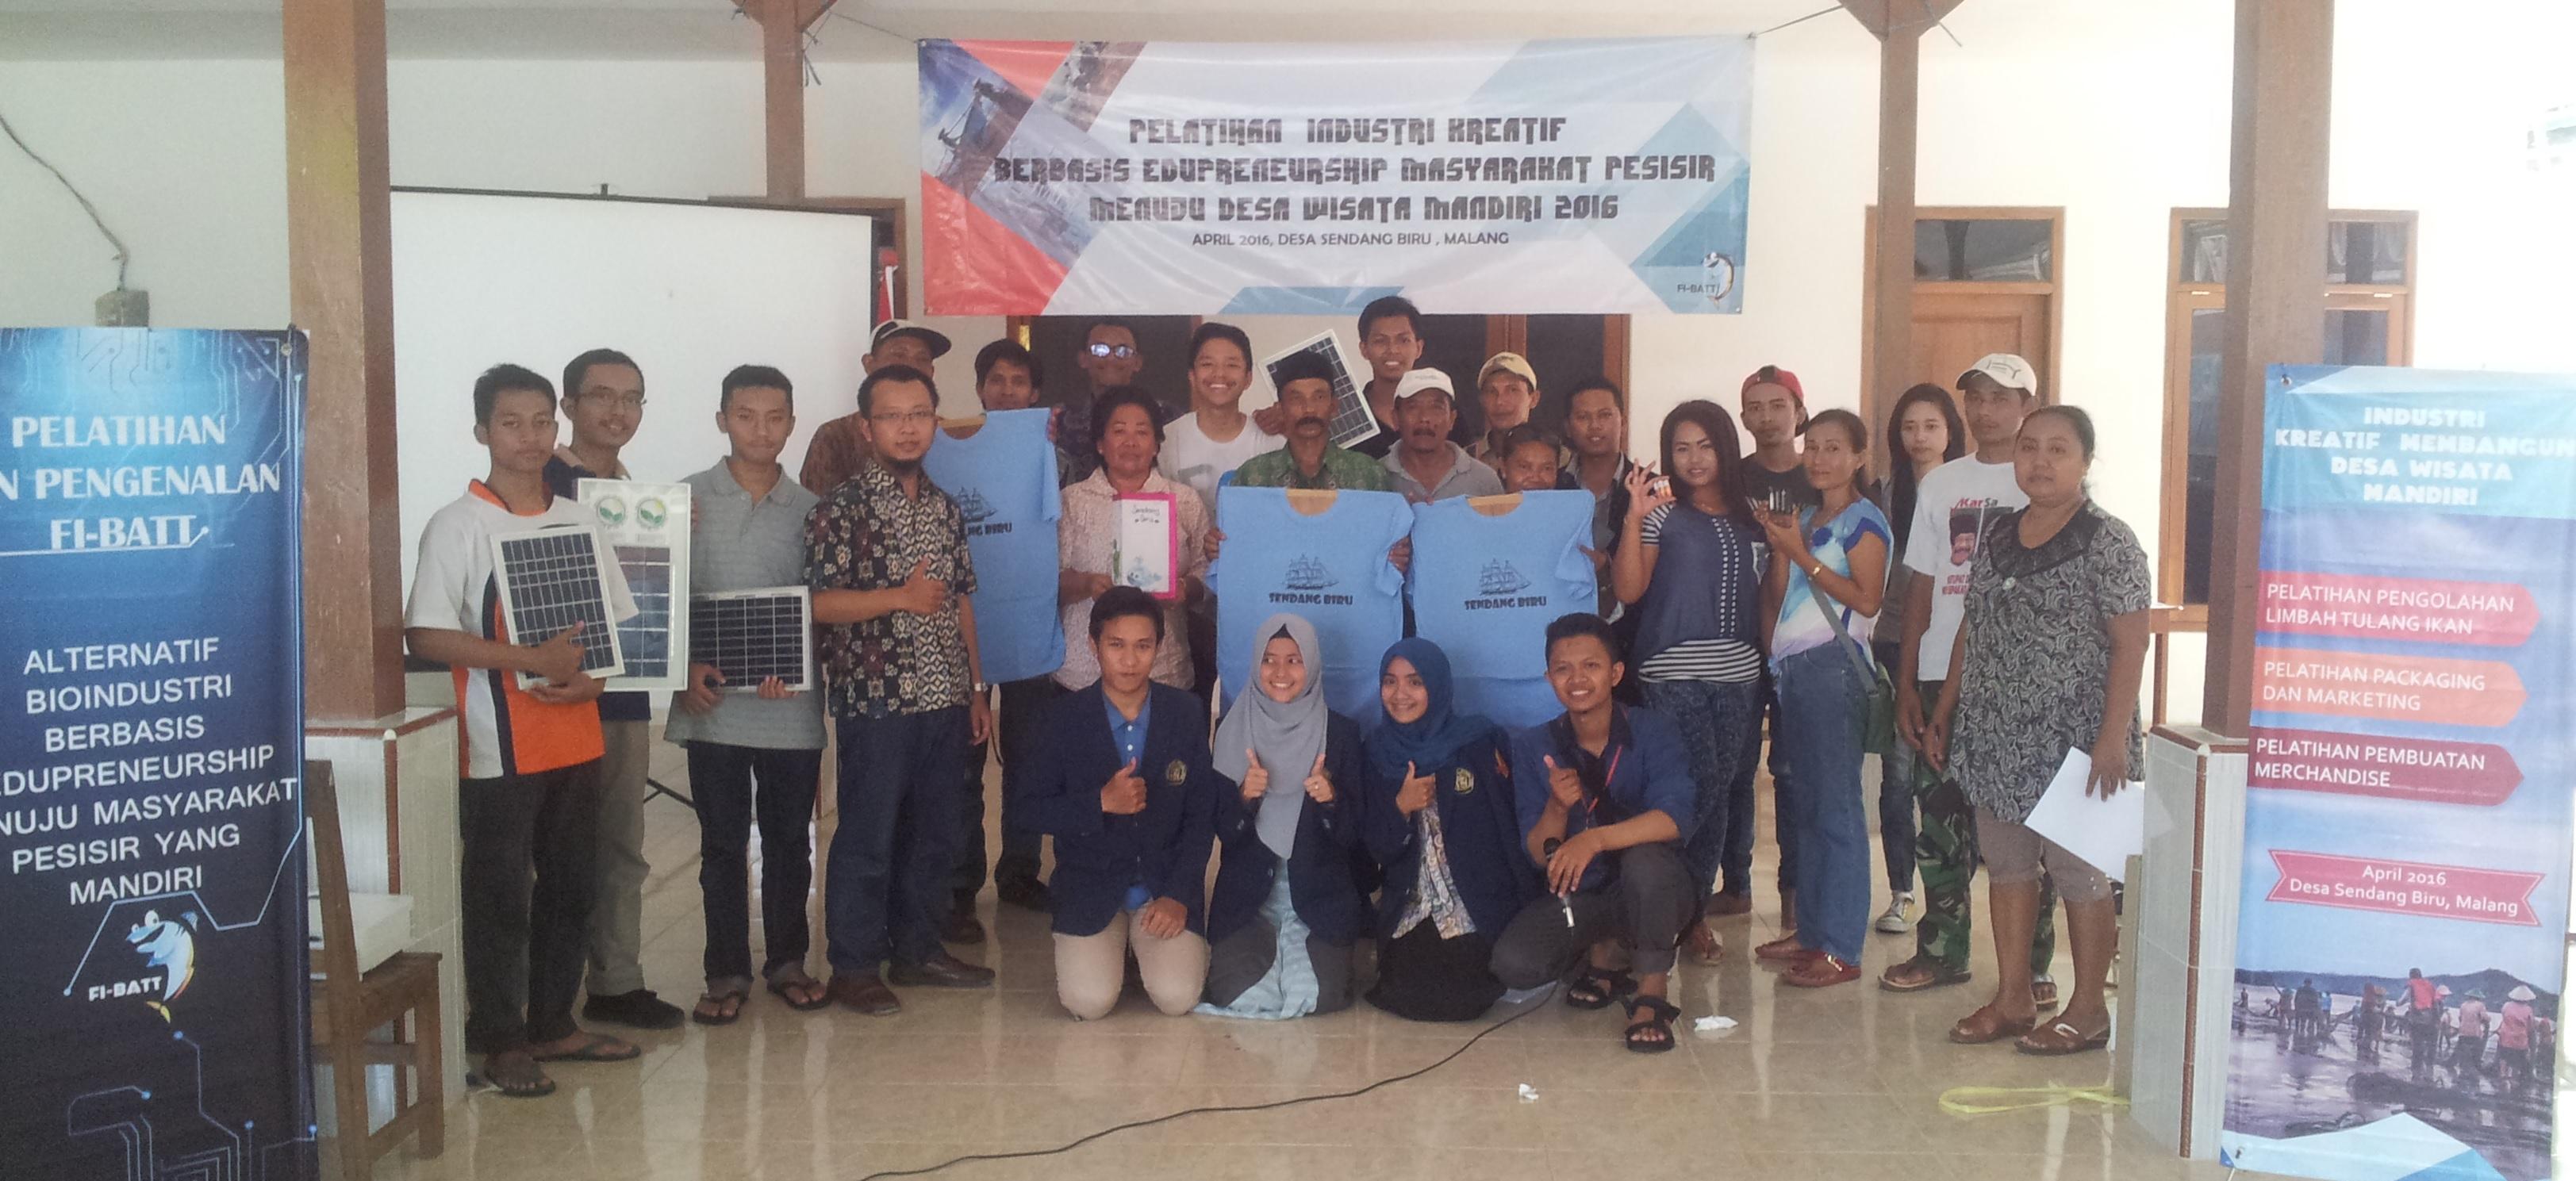 Pelatihan Industri Kreatif Nelayan Sendang Biru dengan Energi Alternatif